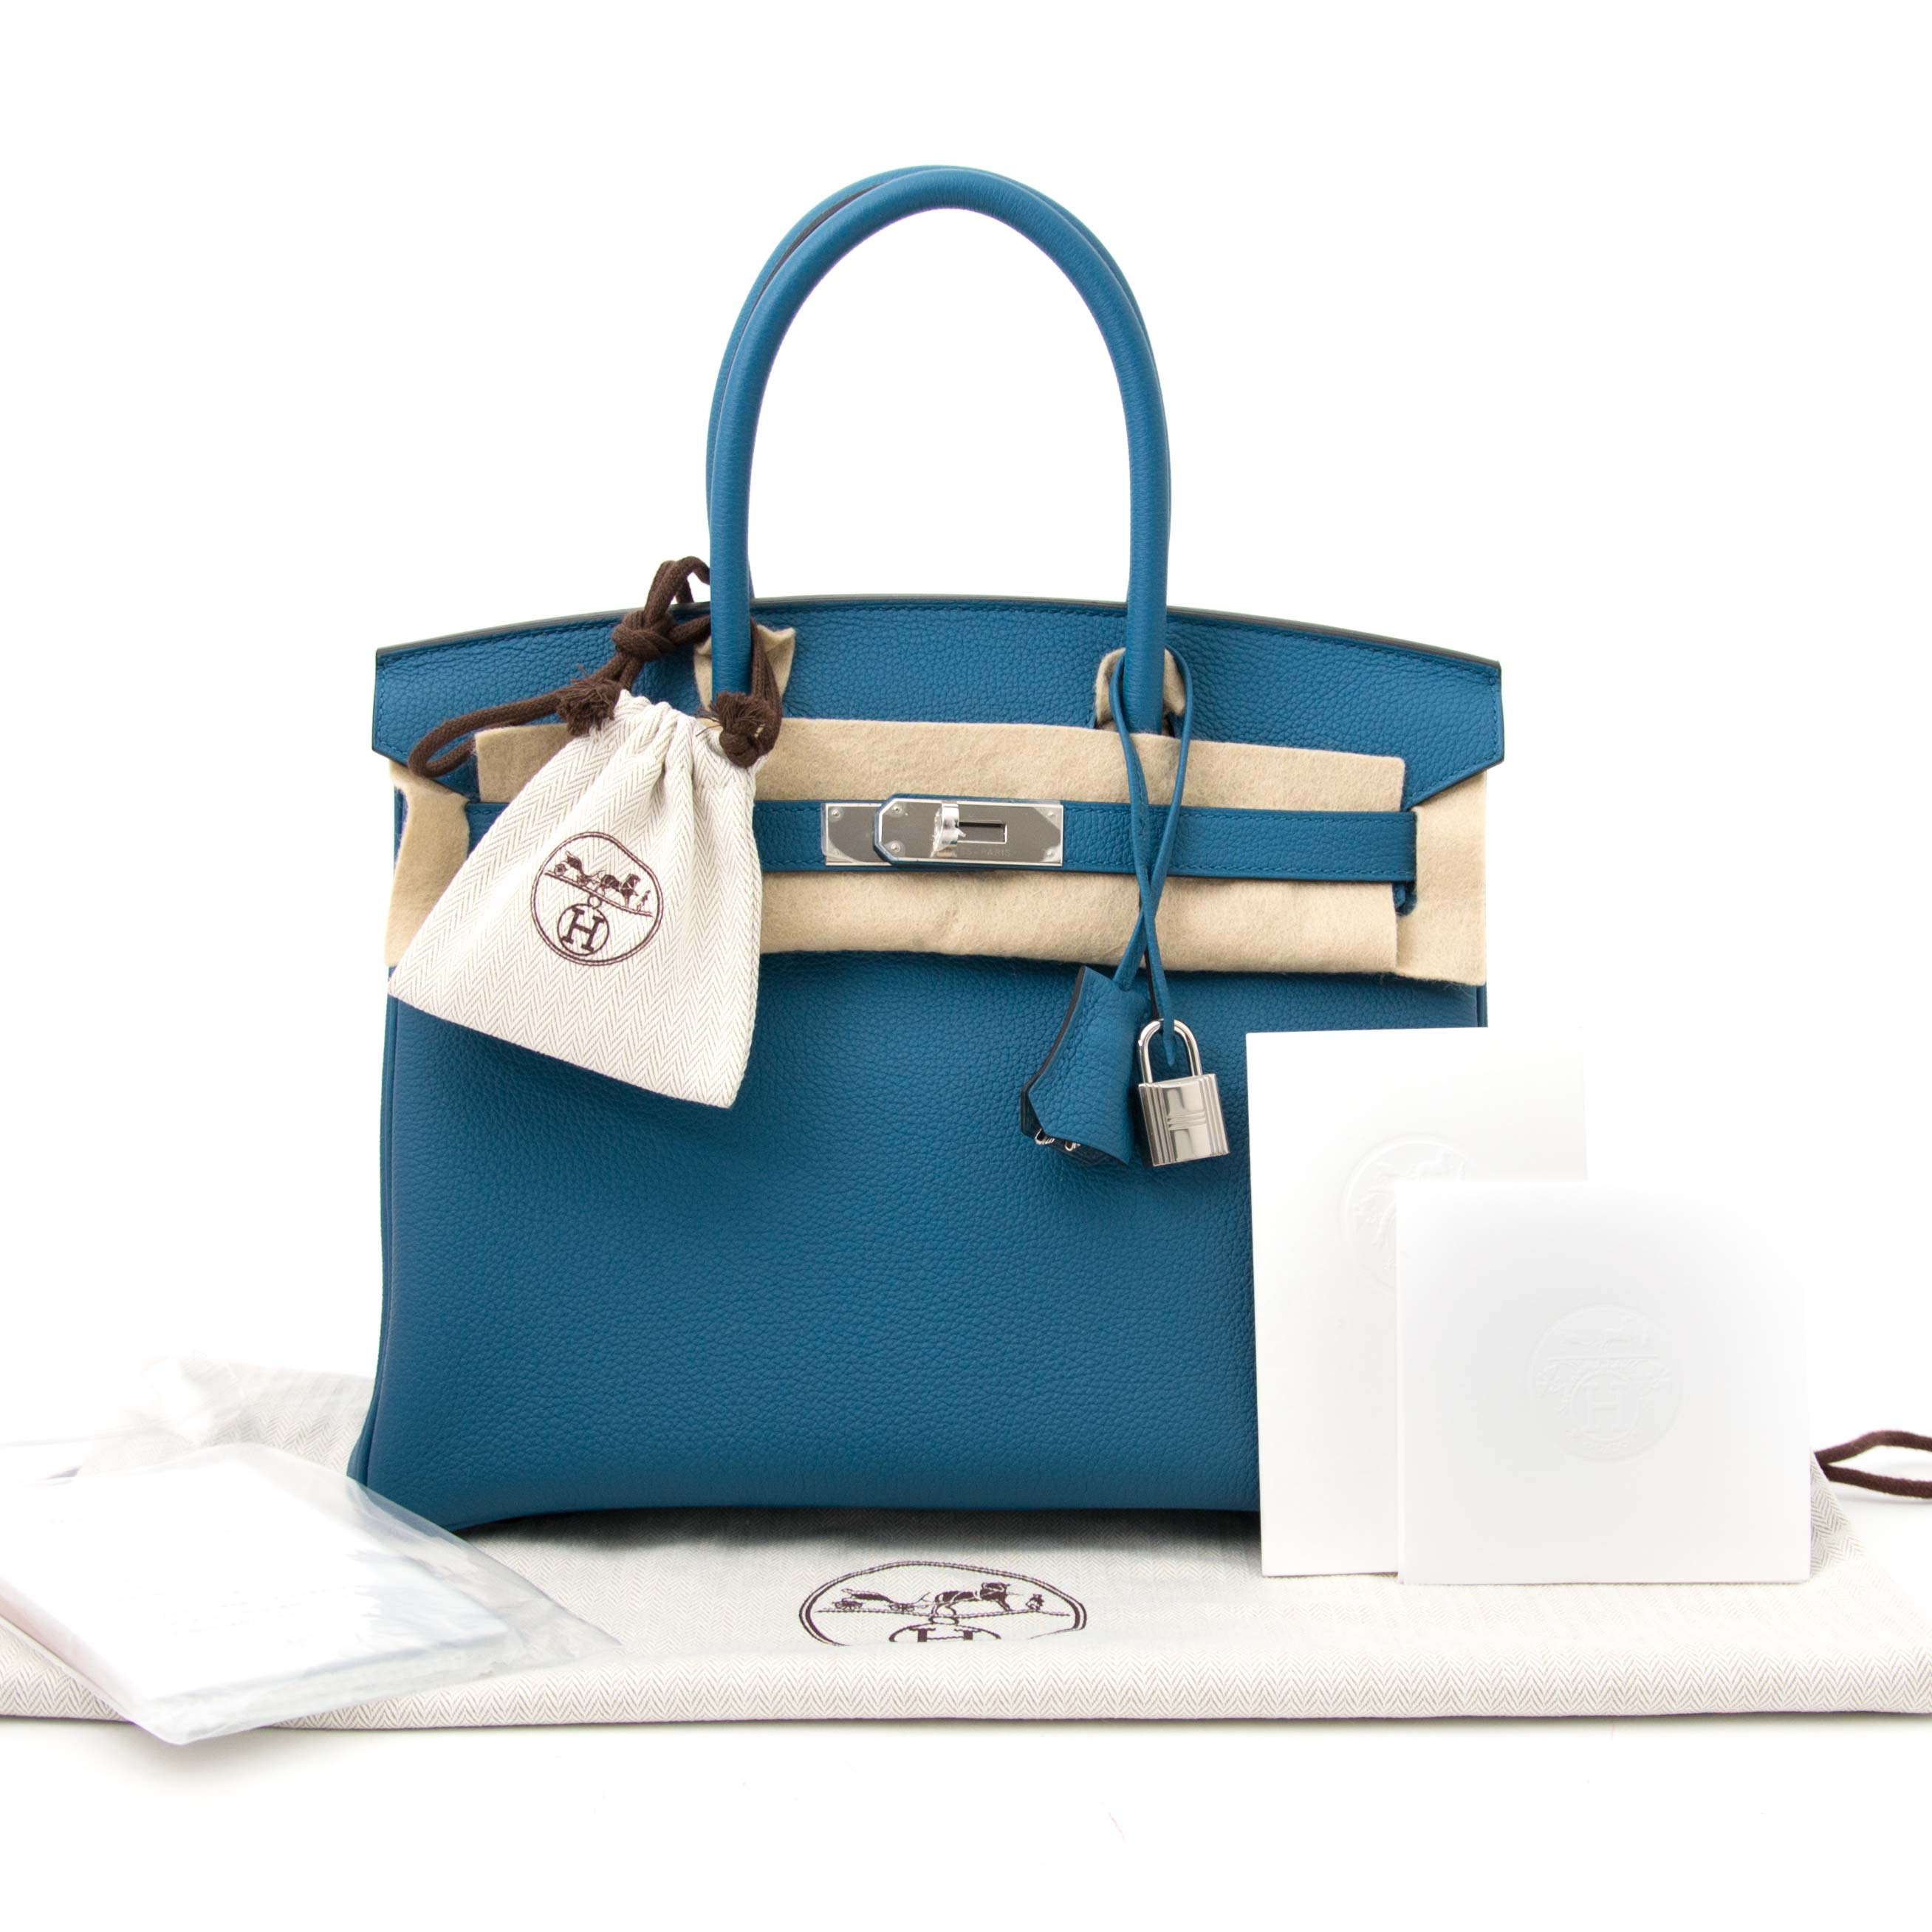 Market leader in Birkin and Kelly bags in Europe is Labellov in Antwerp